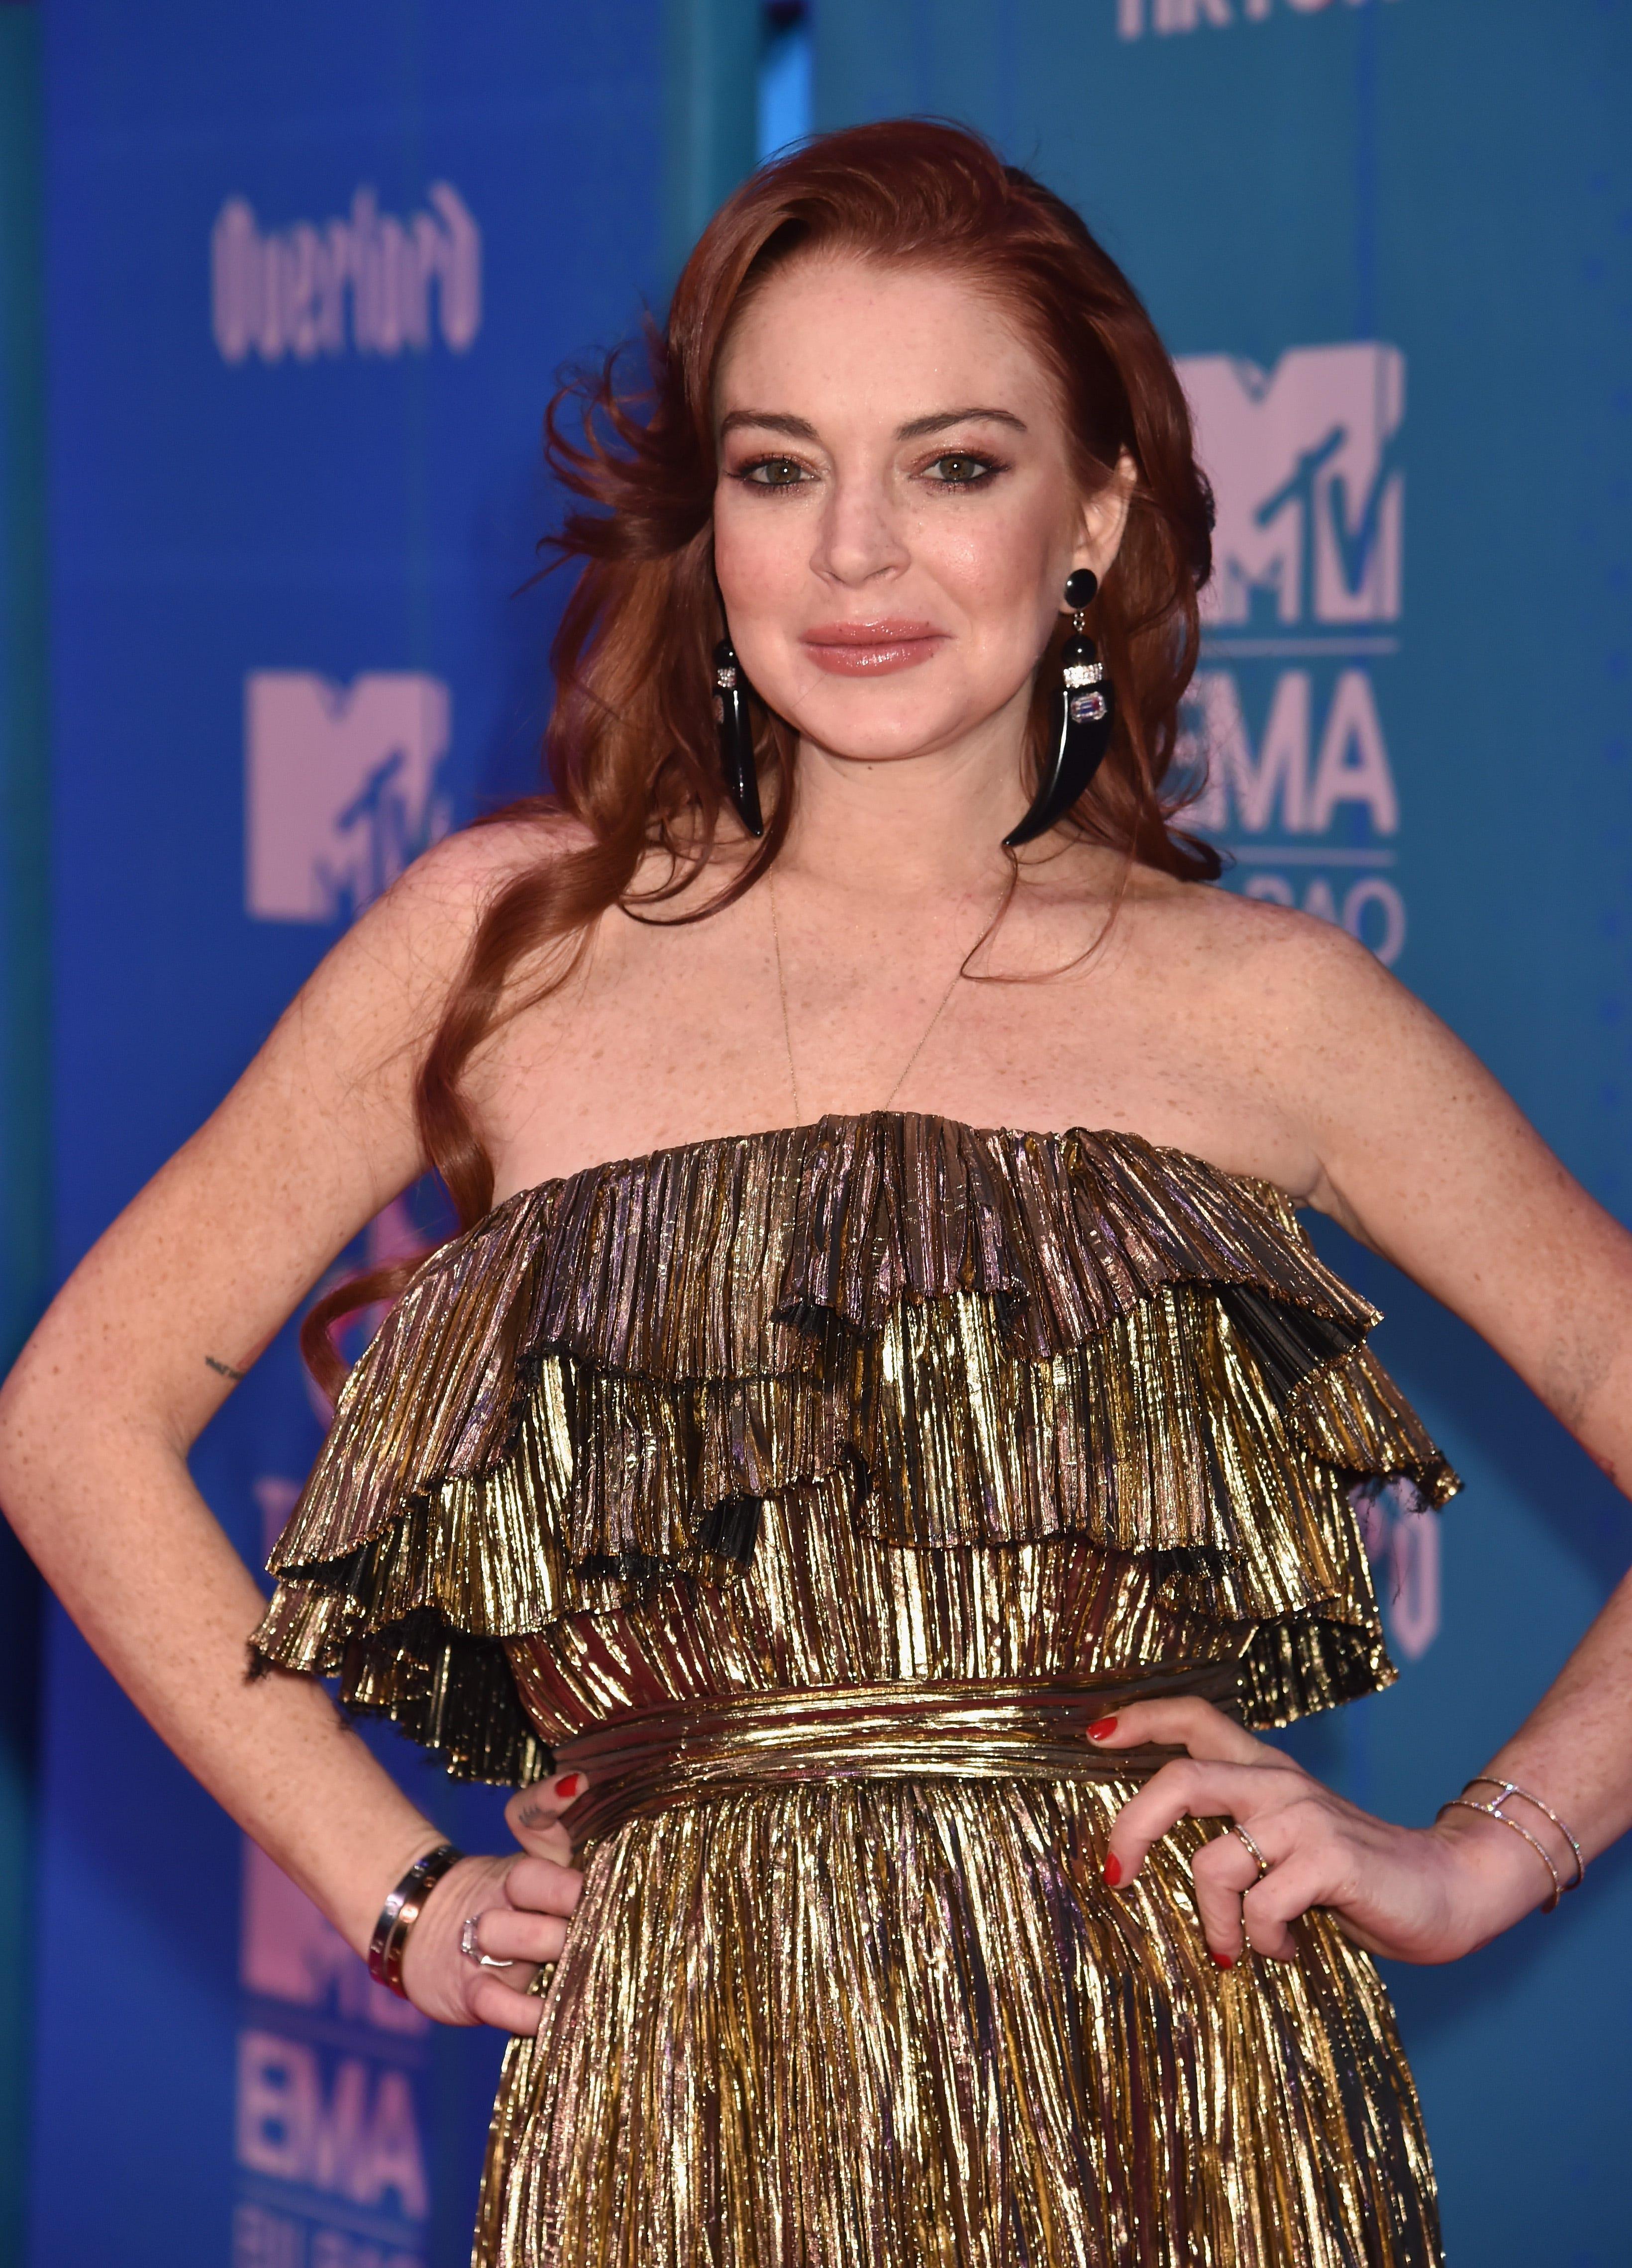 See 'Mean Girls' co-stars Lindsay Lohan and Jonathan Bennett's reunion selfie